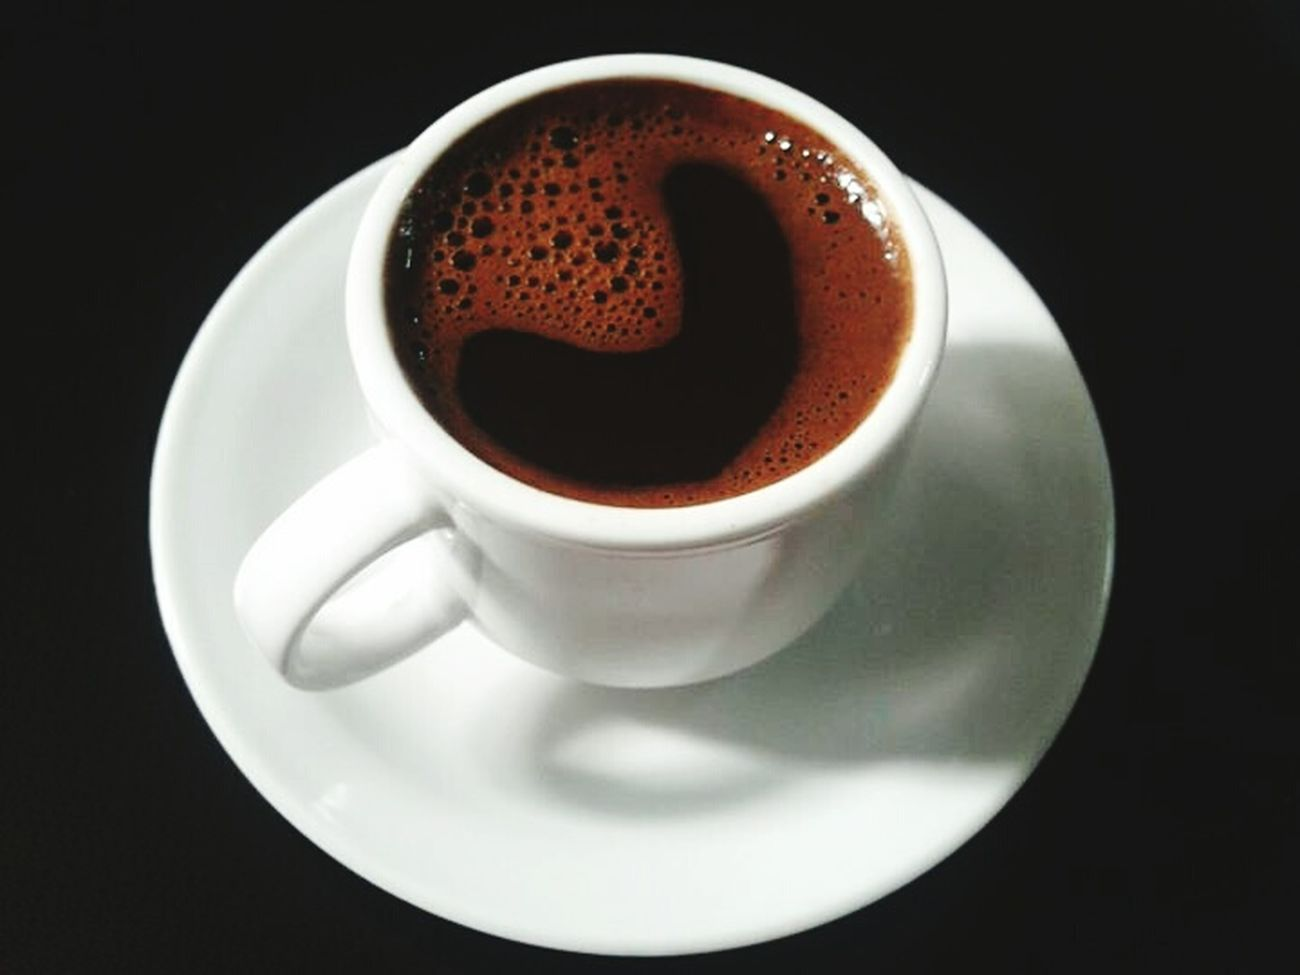 Coffee Cup Sugar Sugar Quality Time Life *-* Amazing يسعد_اوقاتكن